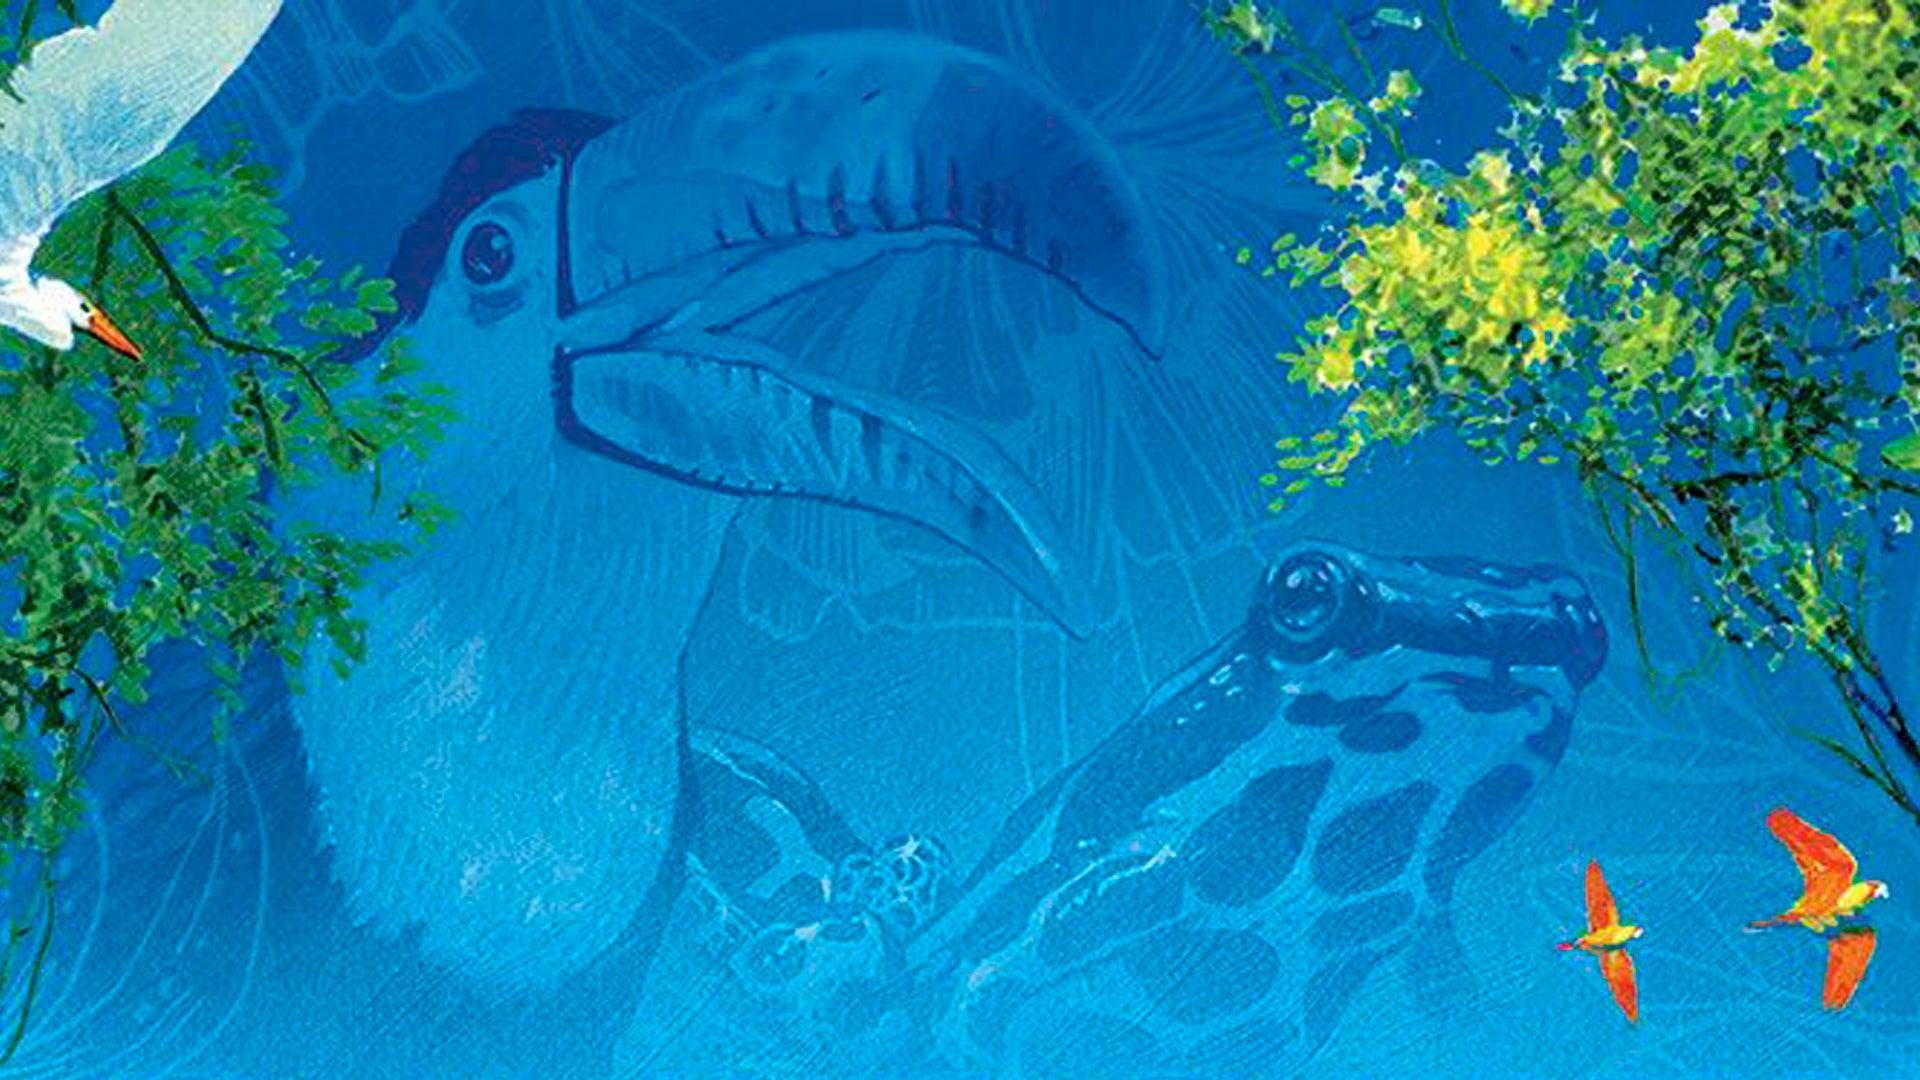 Canopy board game artwork